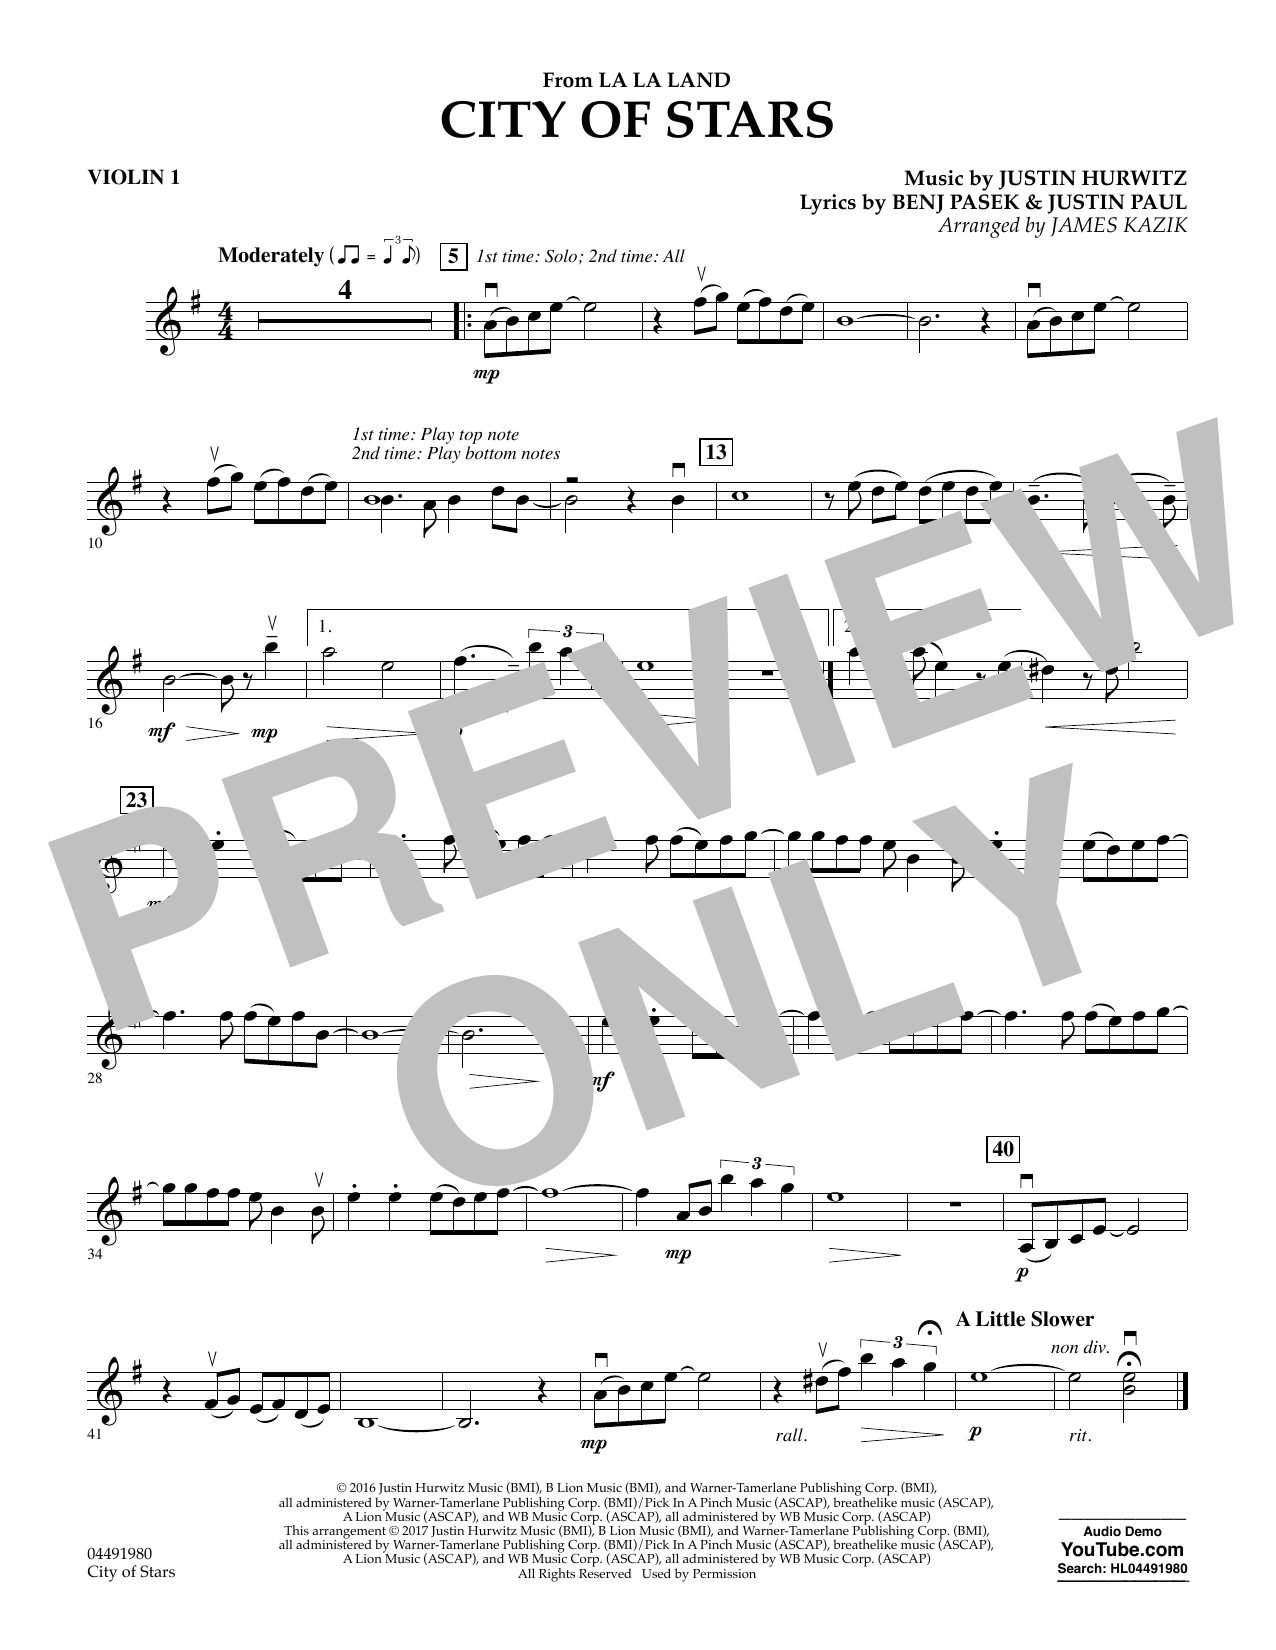 City of Stars (from La La Land) - Violin 1 Sheet Music